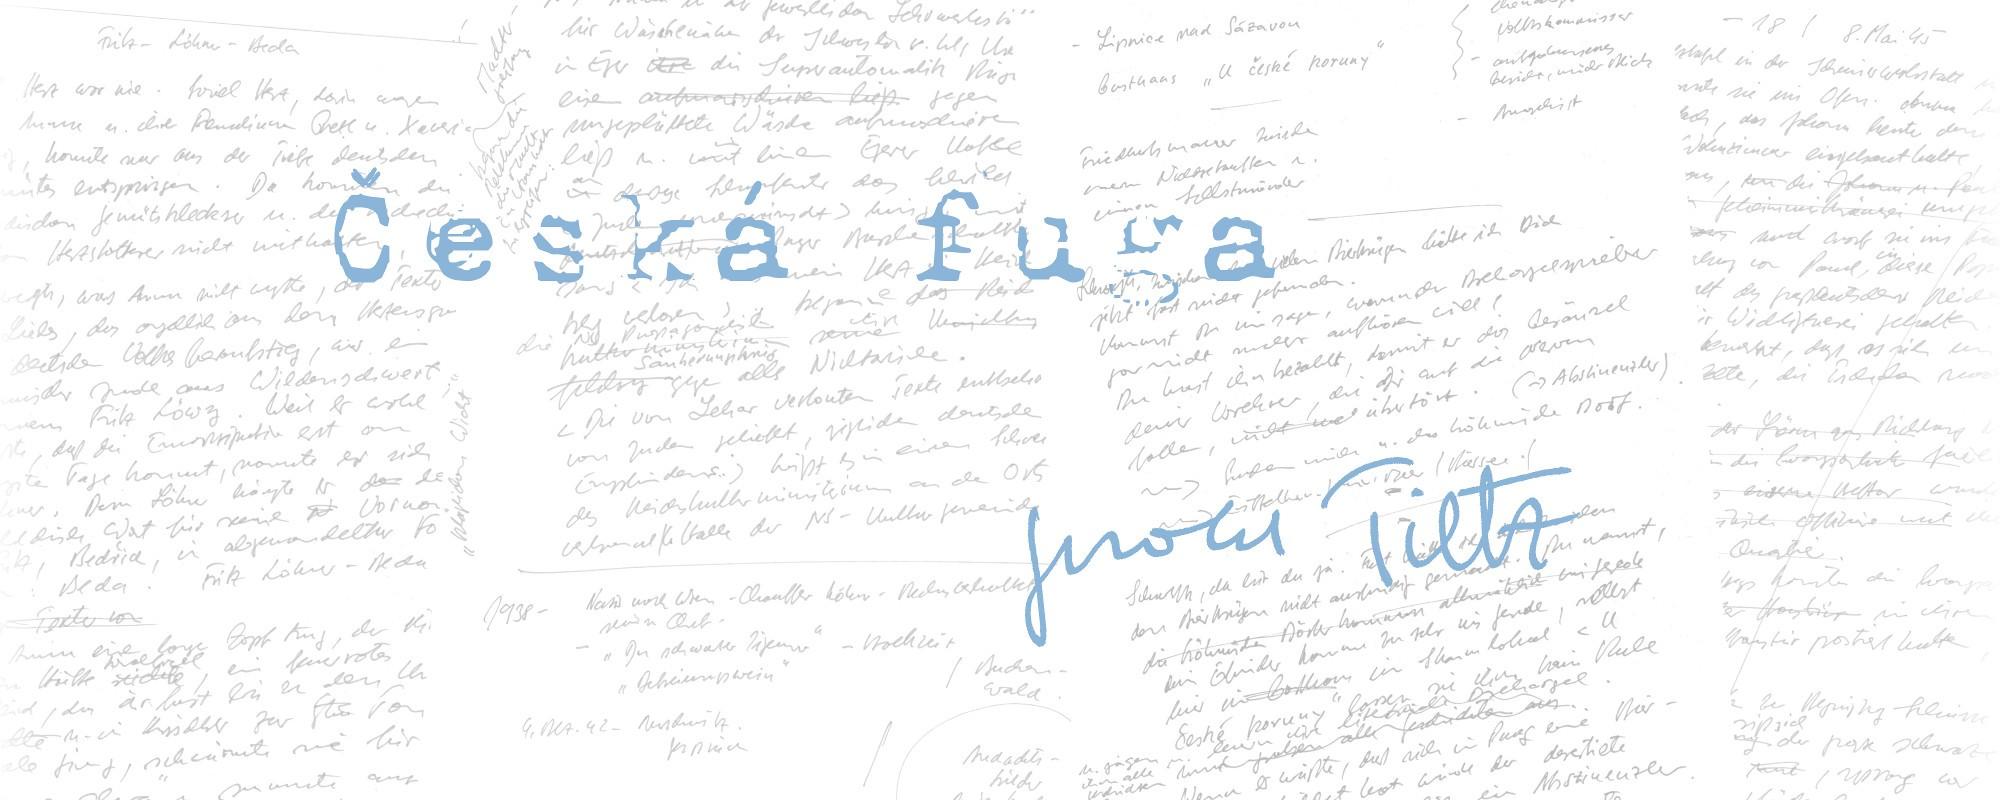 Gerold-Tietz-Ceska-Fuga-Schriftbild